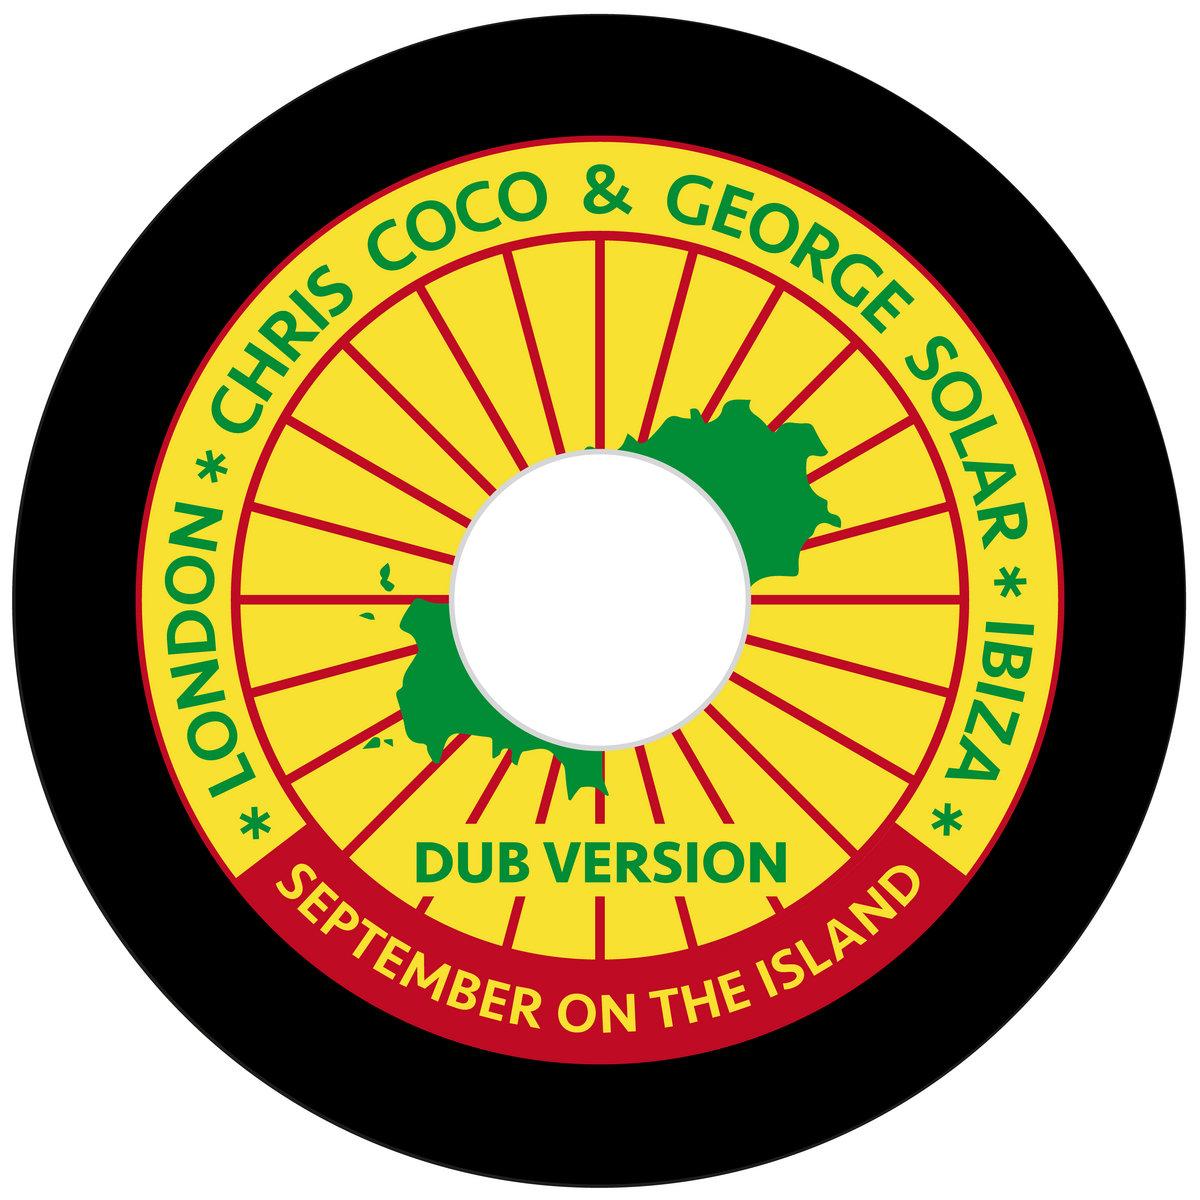 George Solar : September On The Island